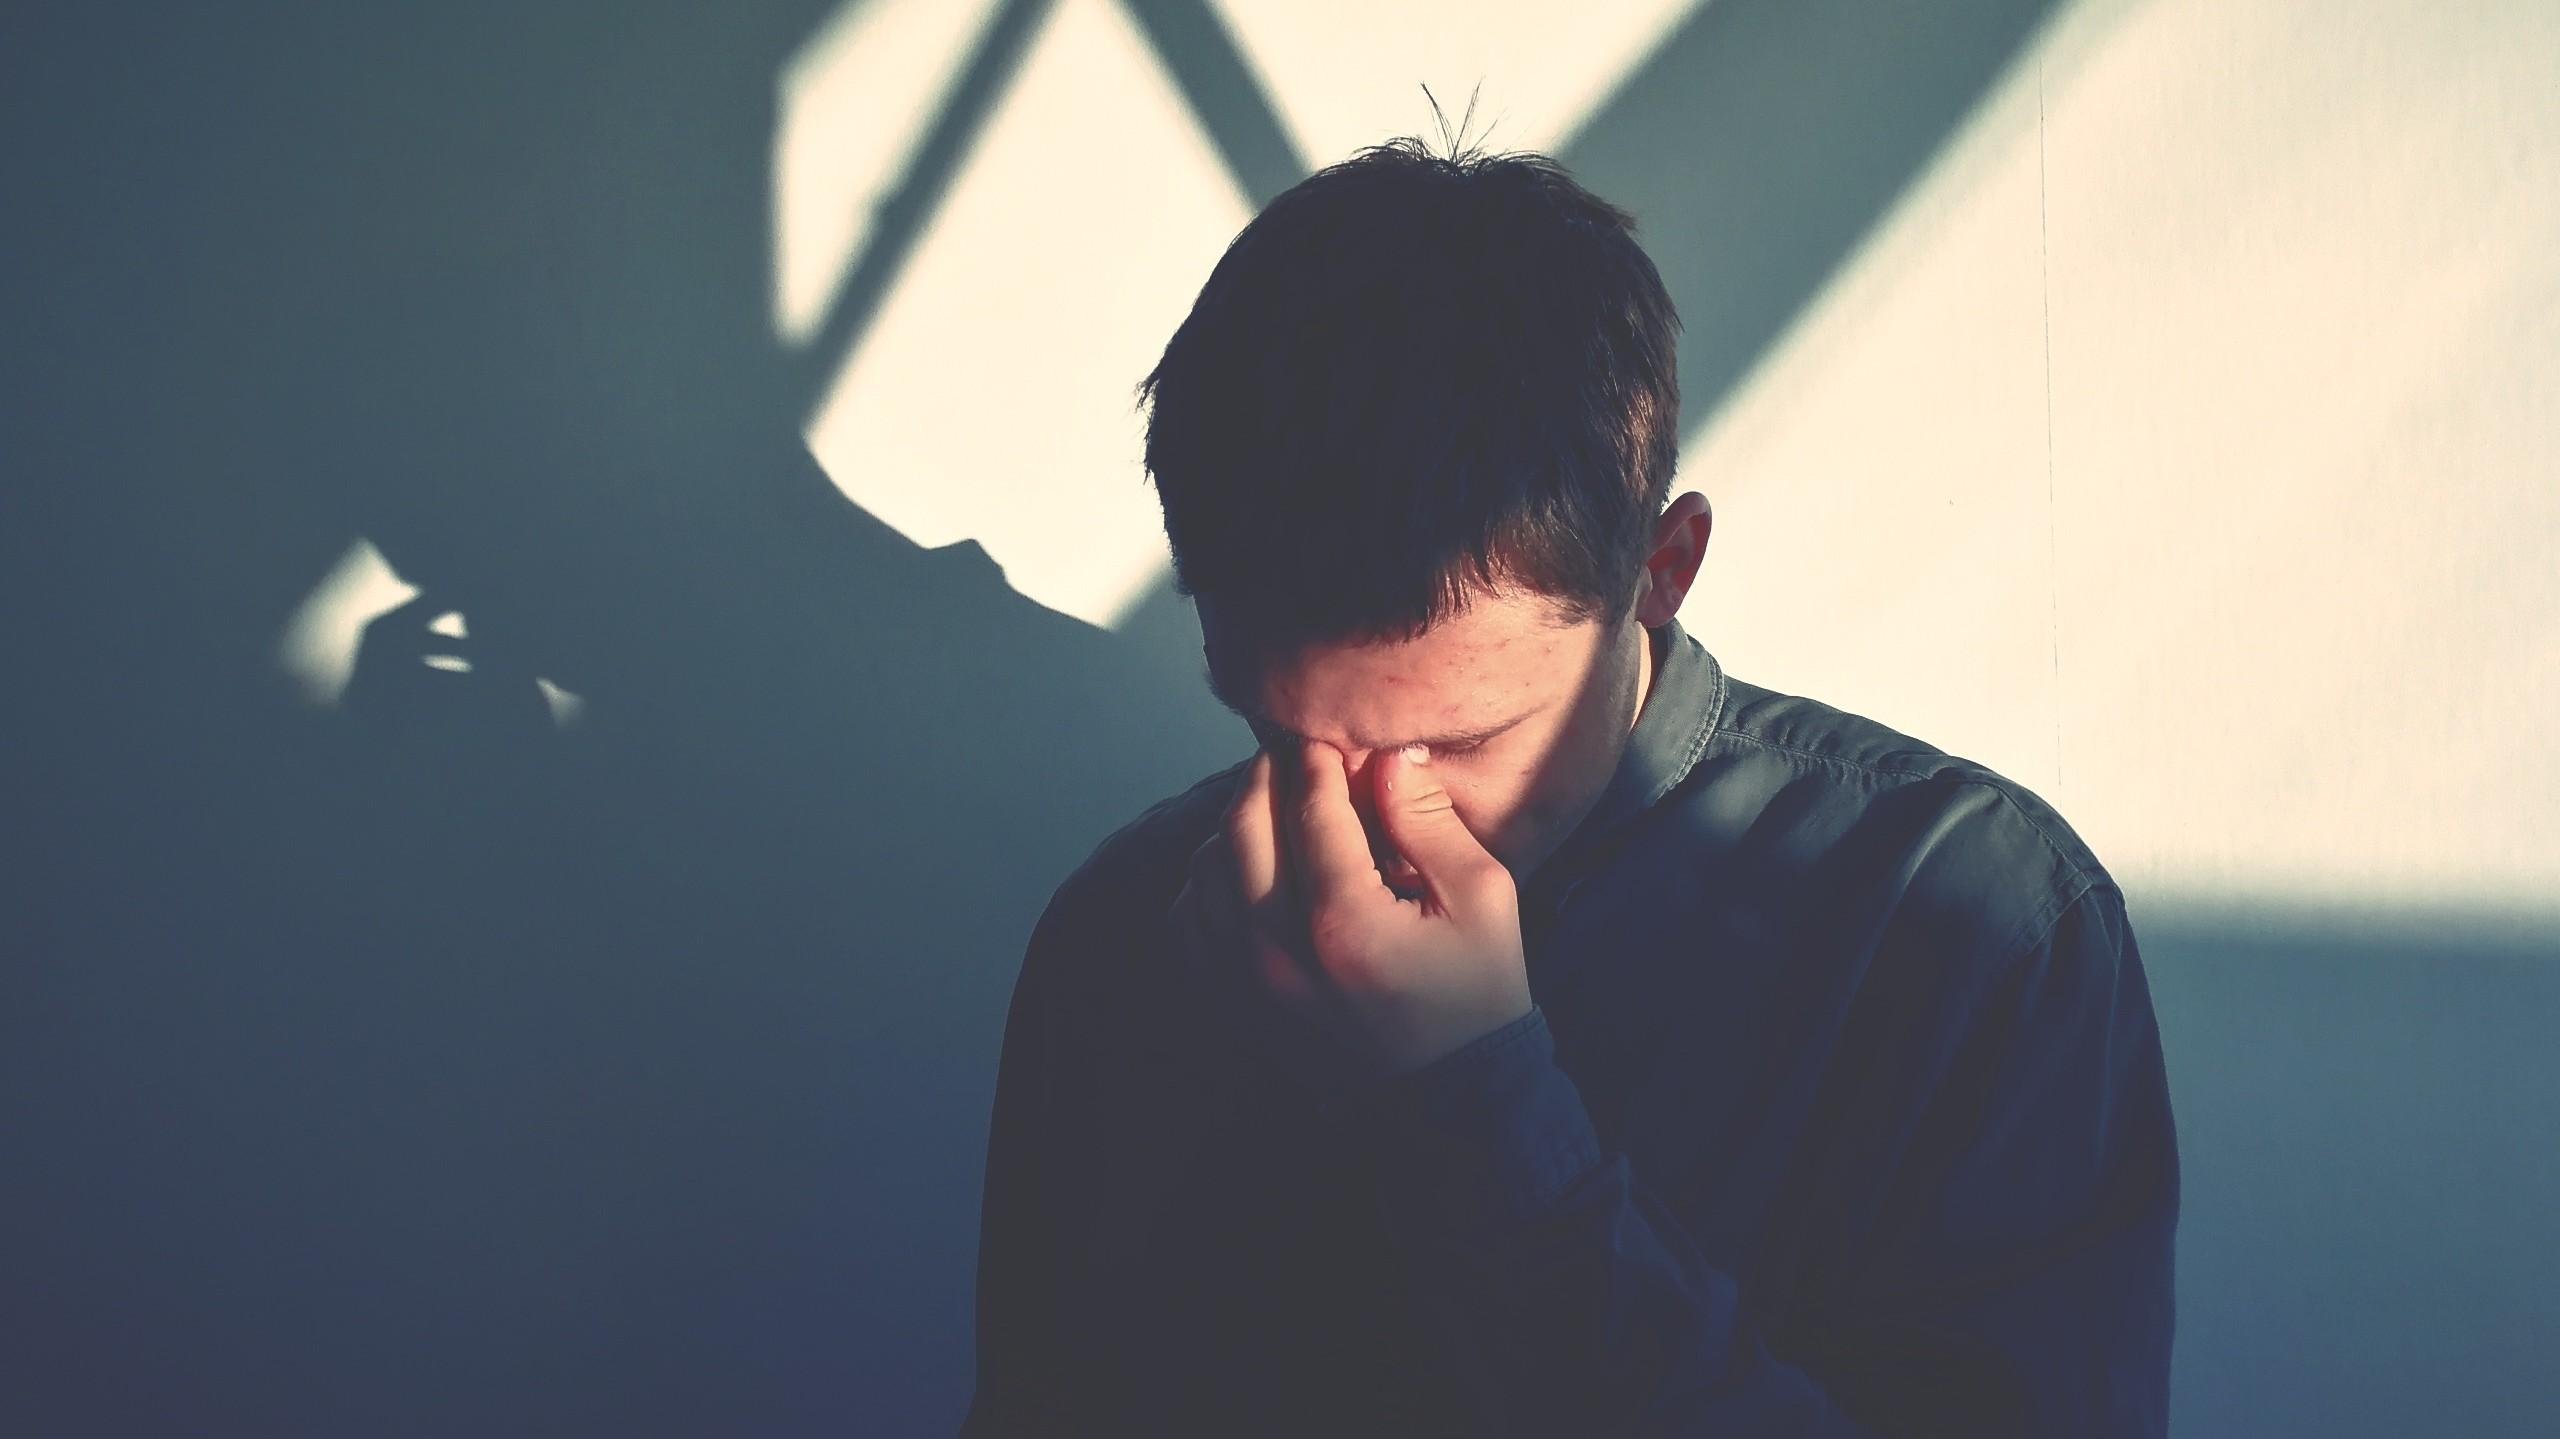 Simptome pe care barbatii nu ar trebui sa le ignore